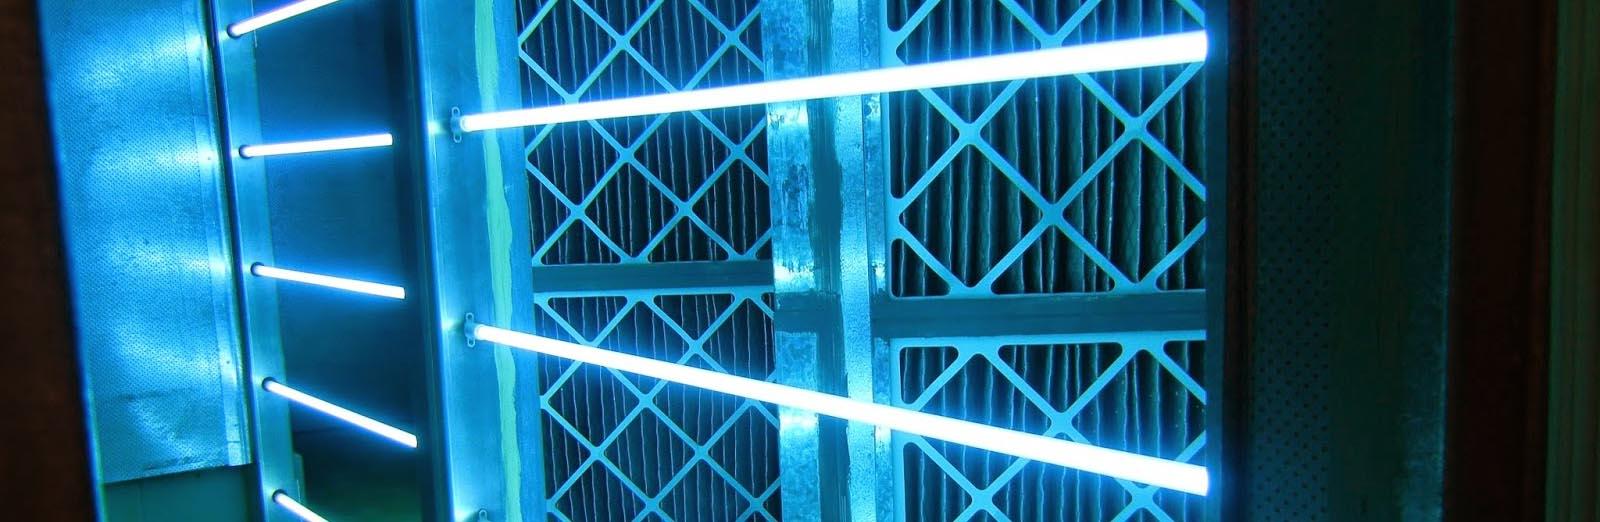 Uv Light Furnace